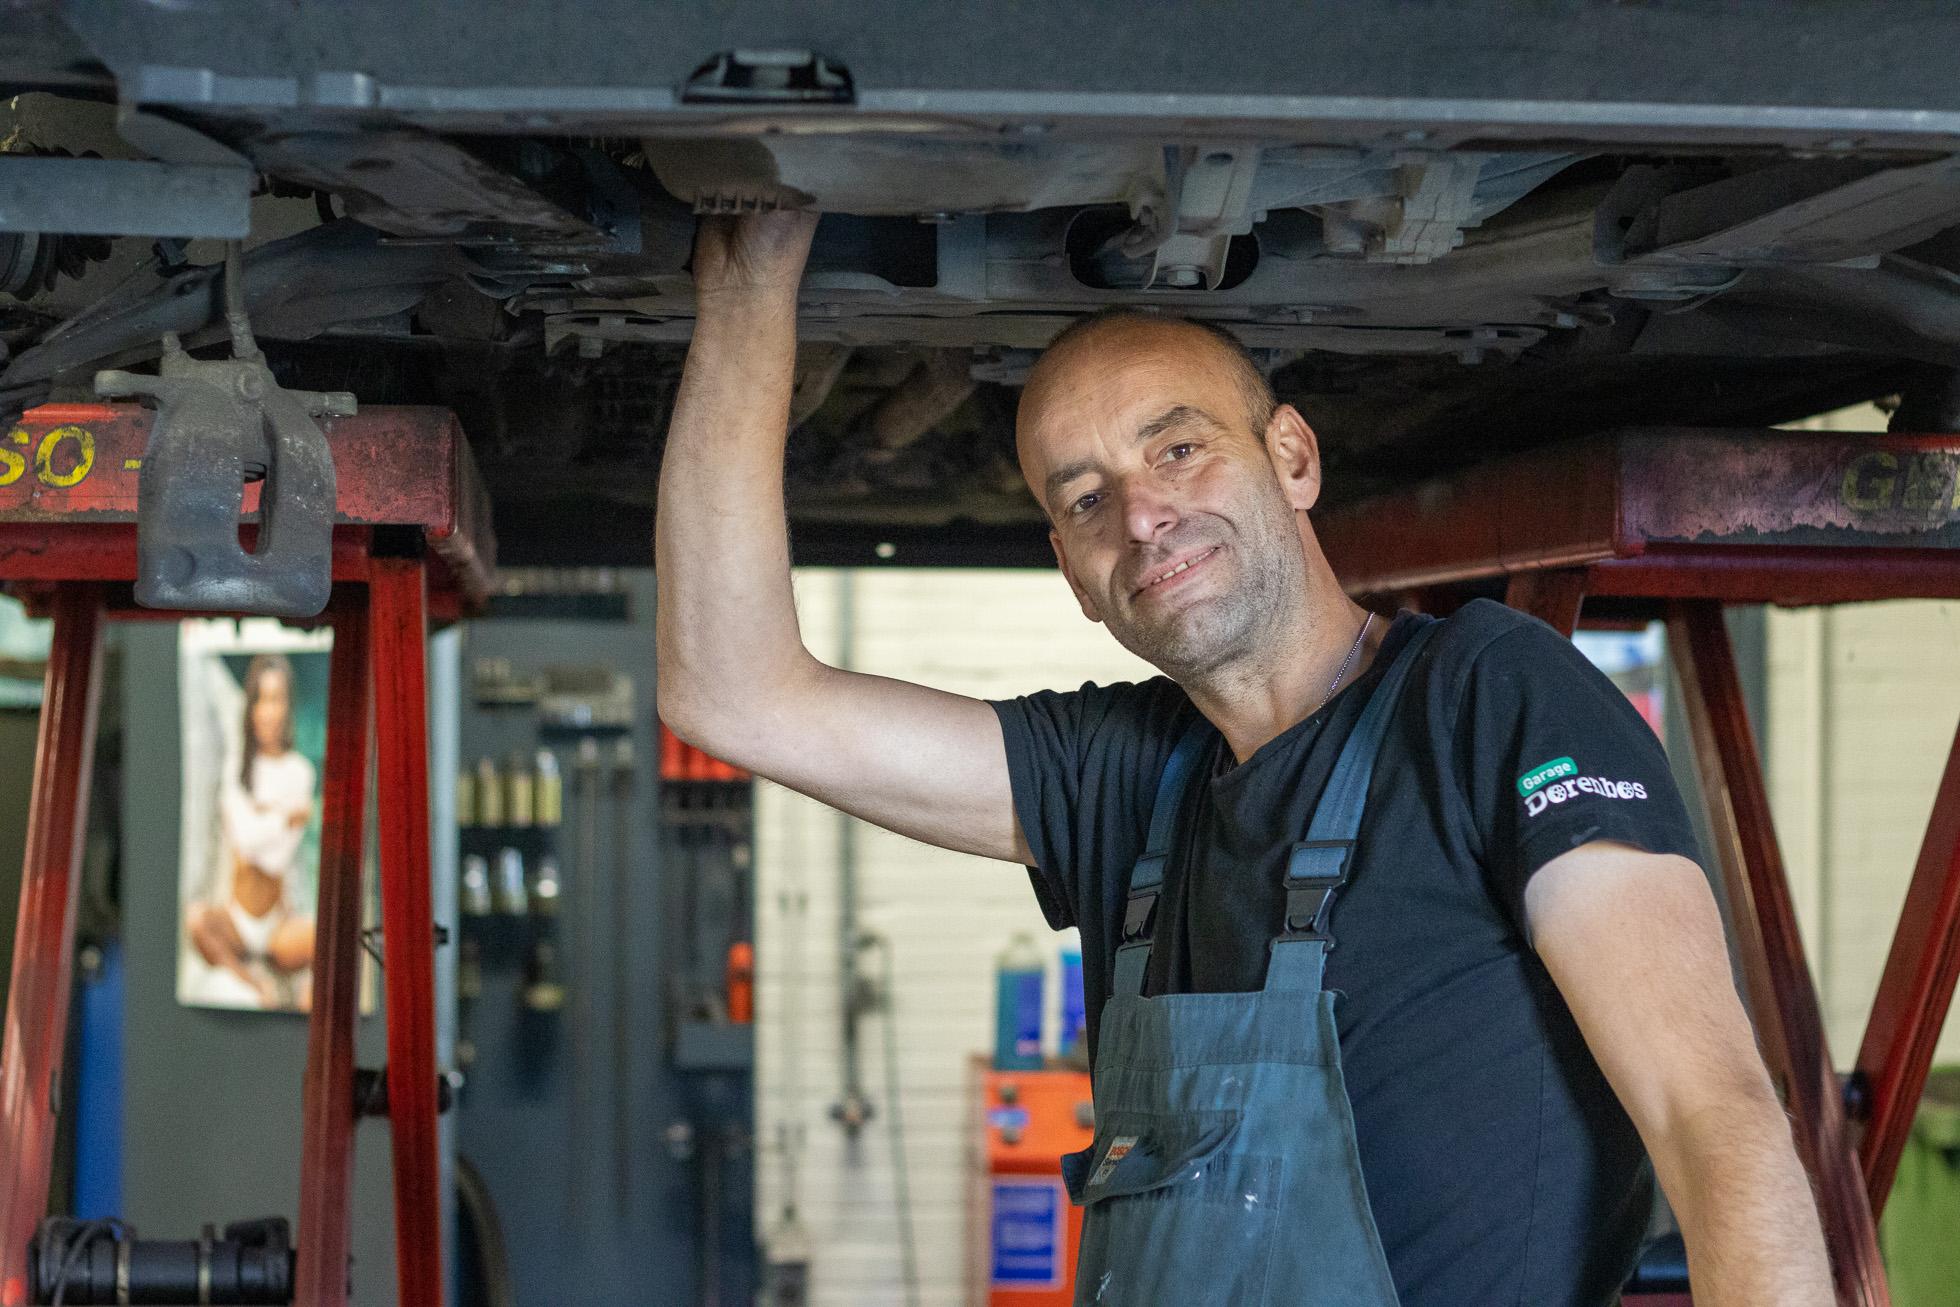 Auto-Garage-BOVAG-RDW-Norg-Drenthe-Monteur-expert-1